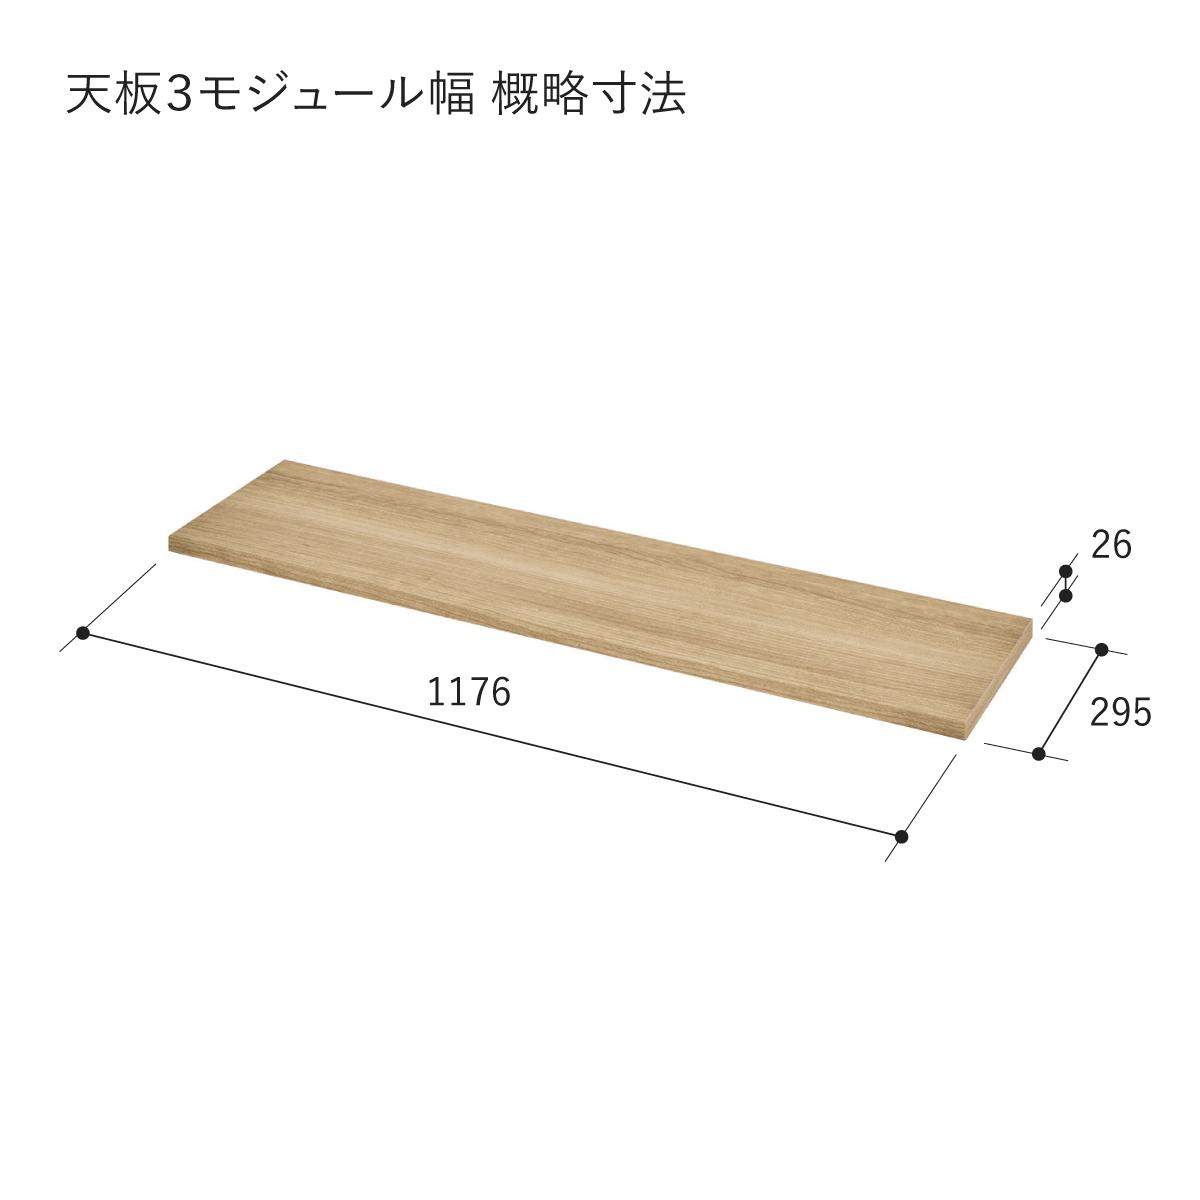 【V-TISS LIGHT】 天板 3モジュール幅(背面溝なし)